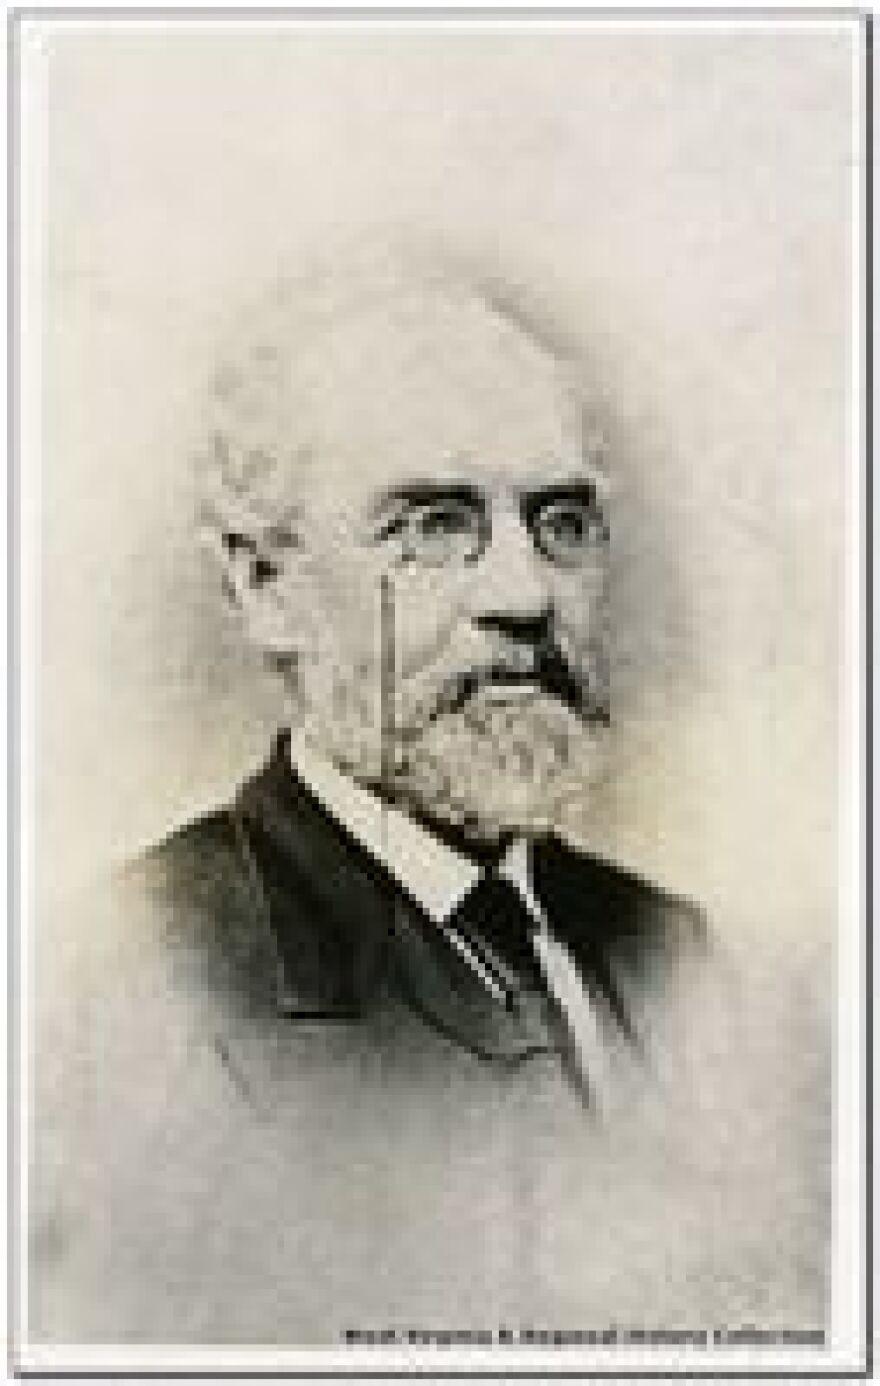 Alexander Boteler